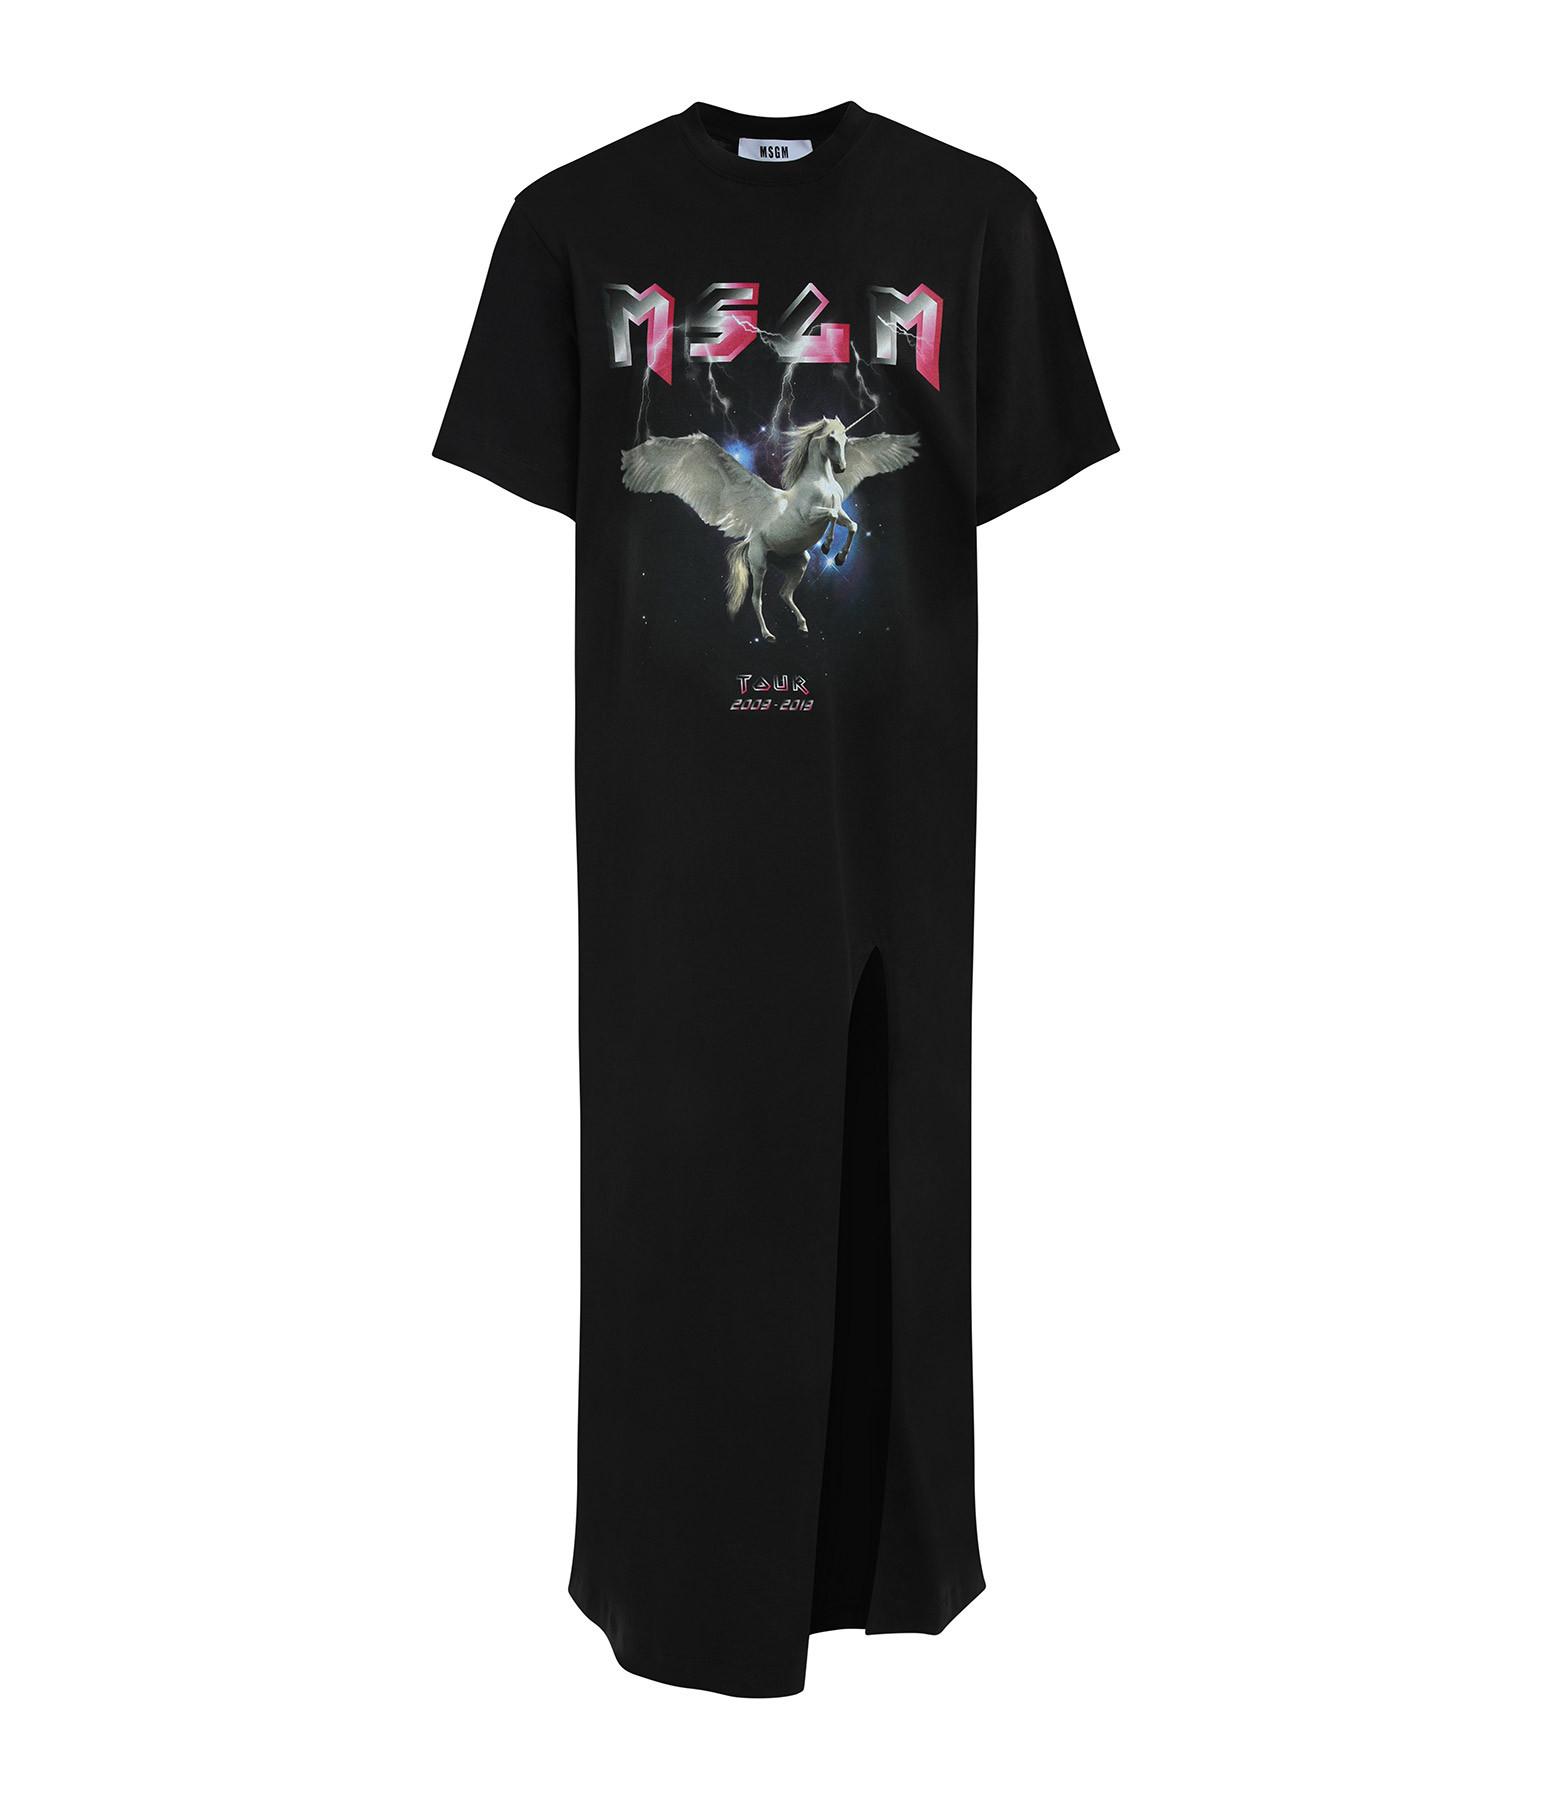 MSGM - Robe Tee-shirt Long Coton Noir